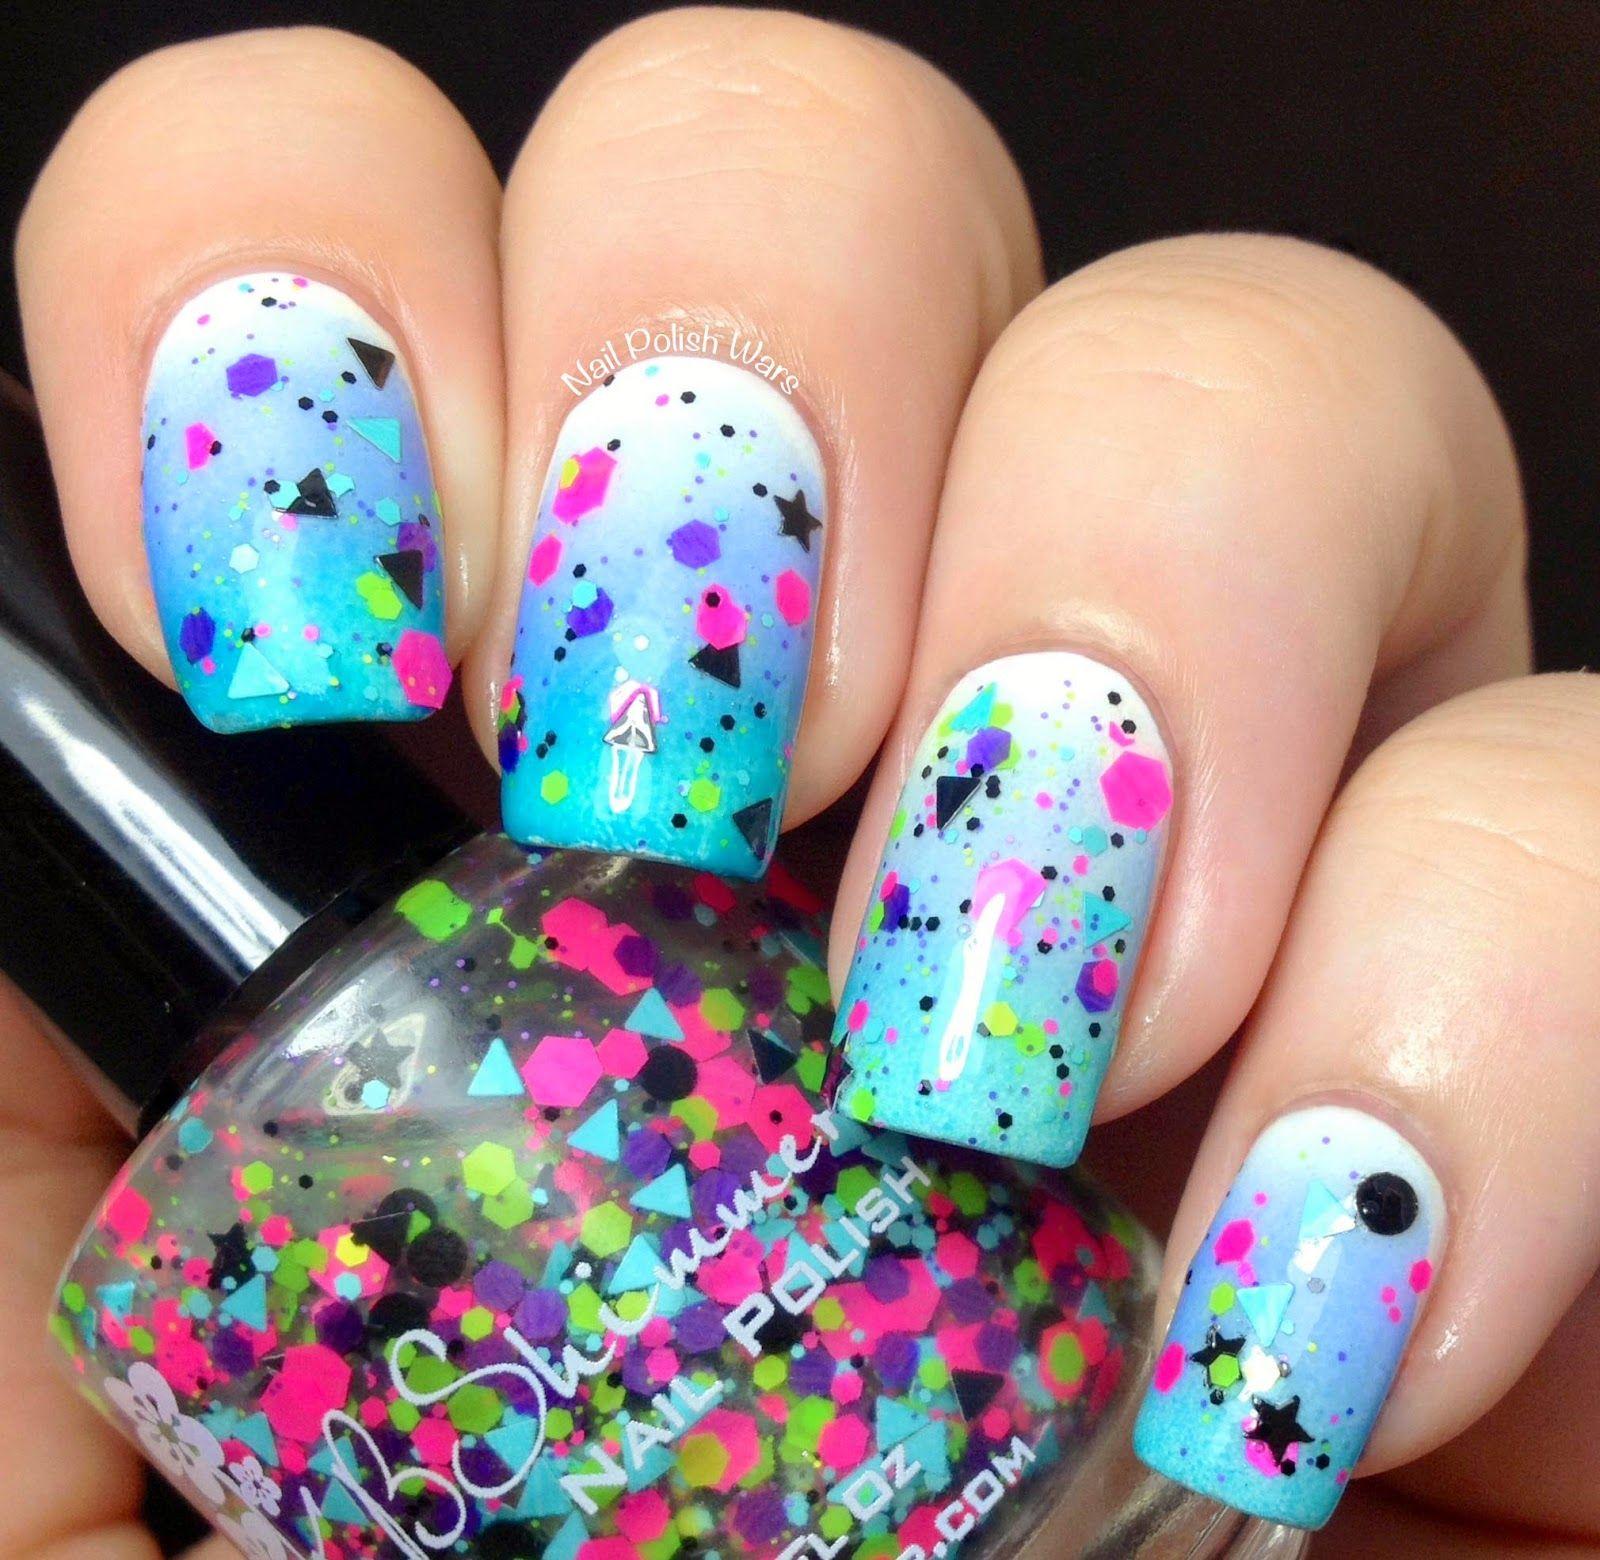 Graffiti Gradient | Hair & Make-Up | Pinterest | Graffiti and Makeup